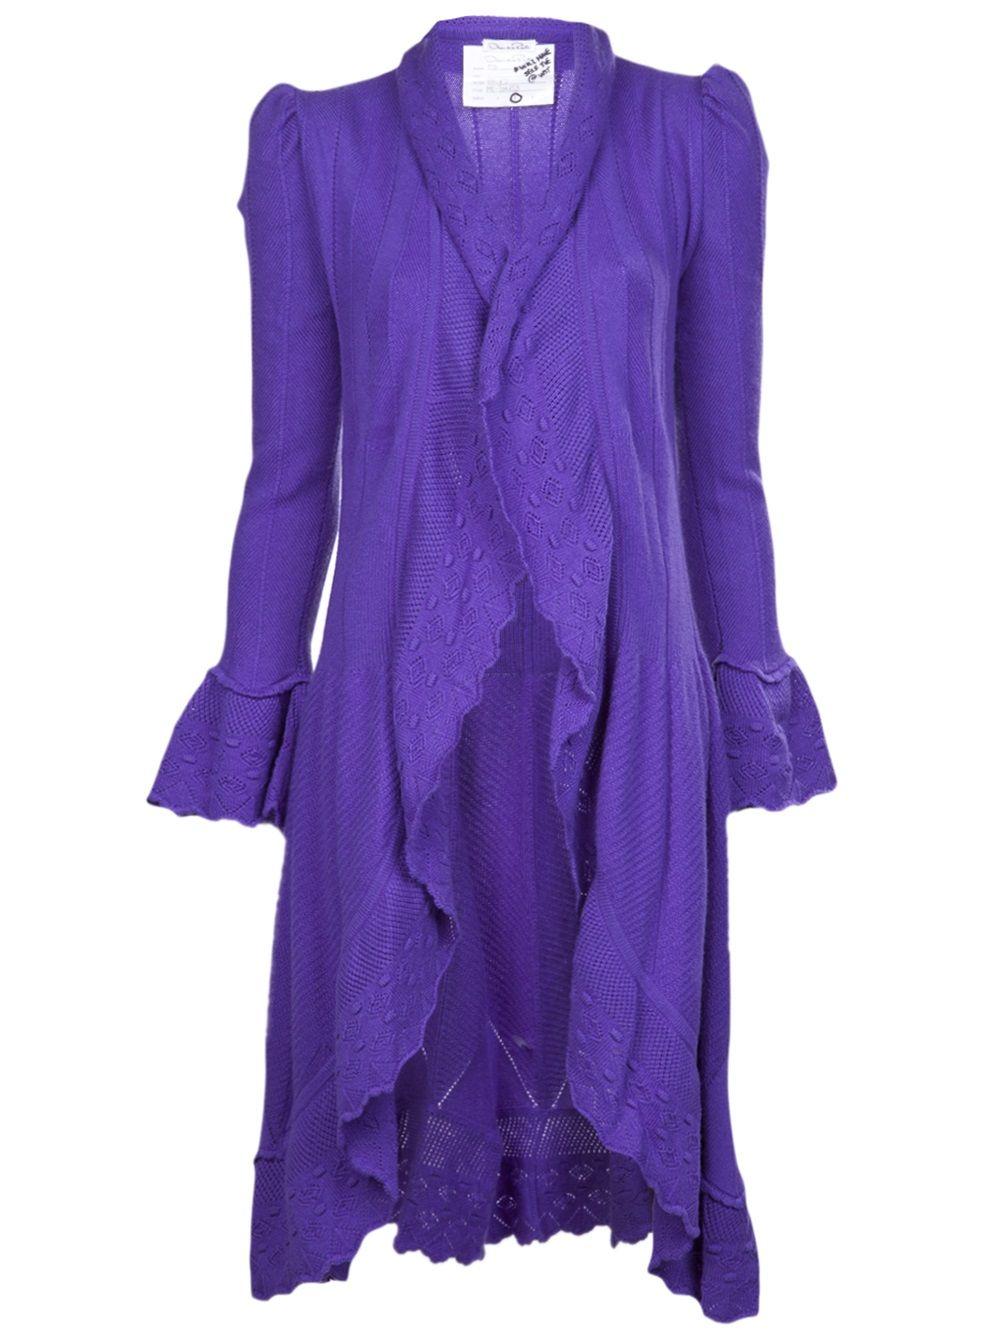 OSCAR DE LA RENTA knit duster cardigan $4274.74 | CARDIGANS AND ...